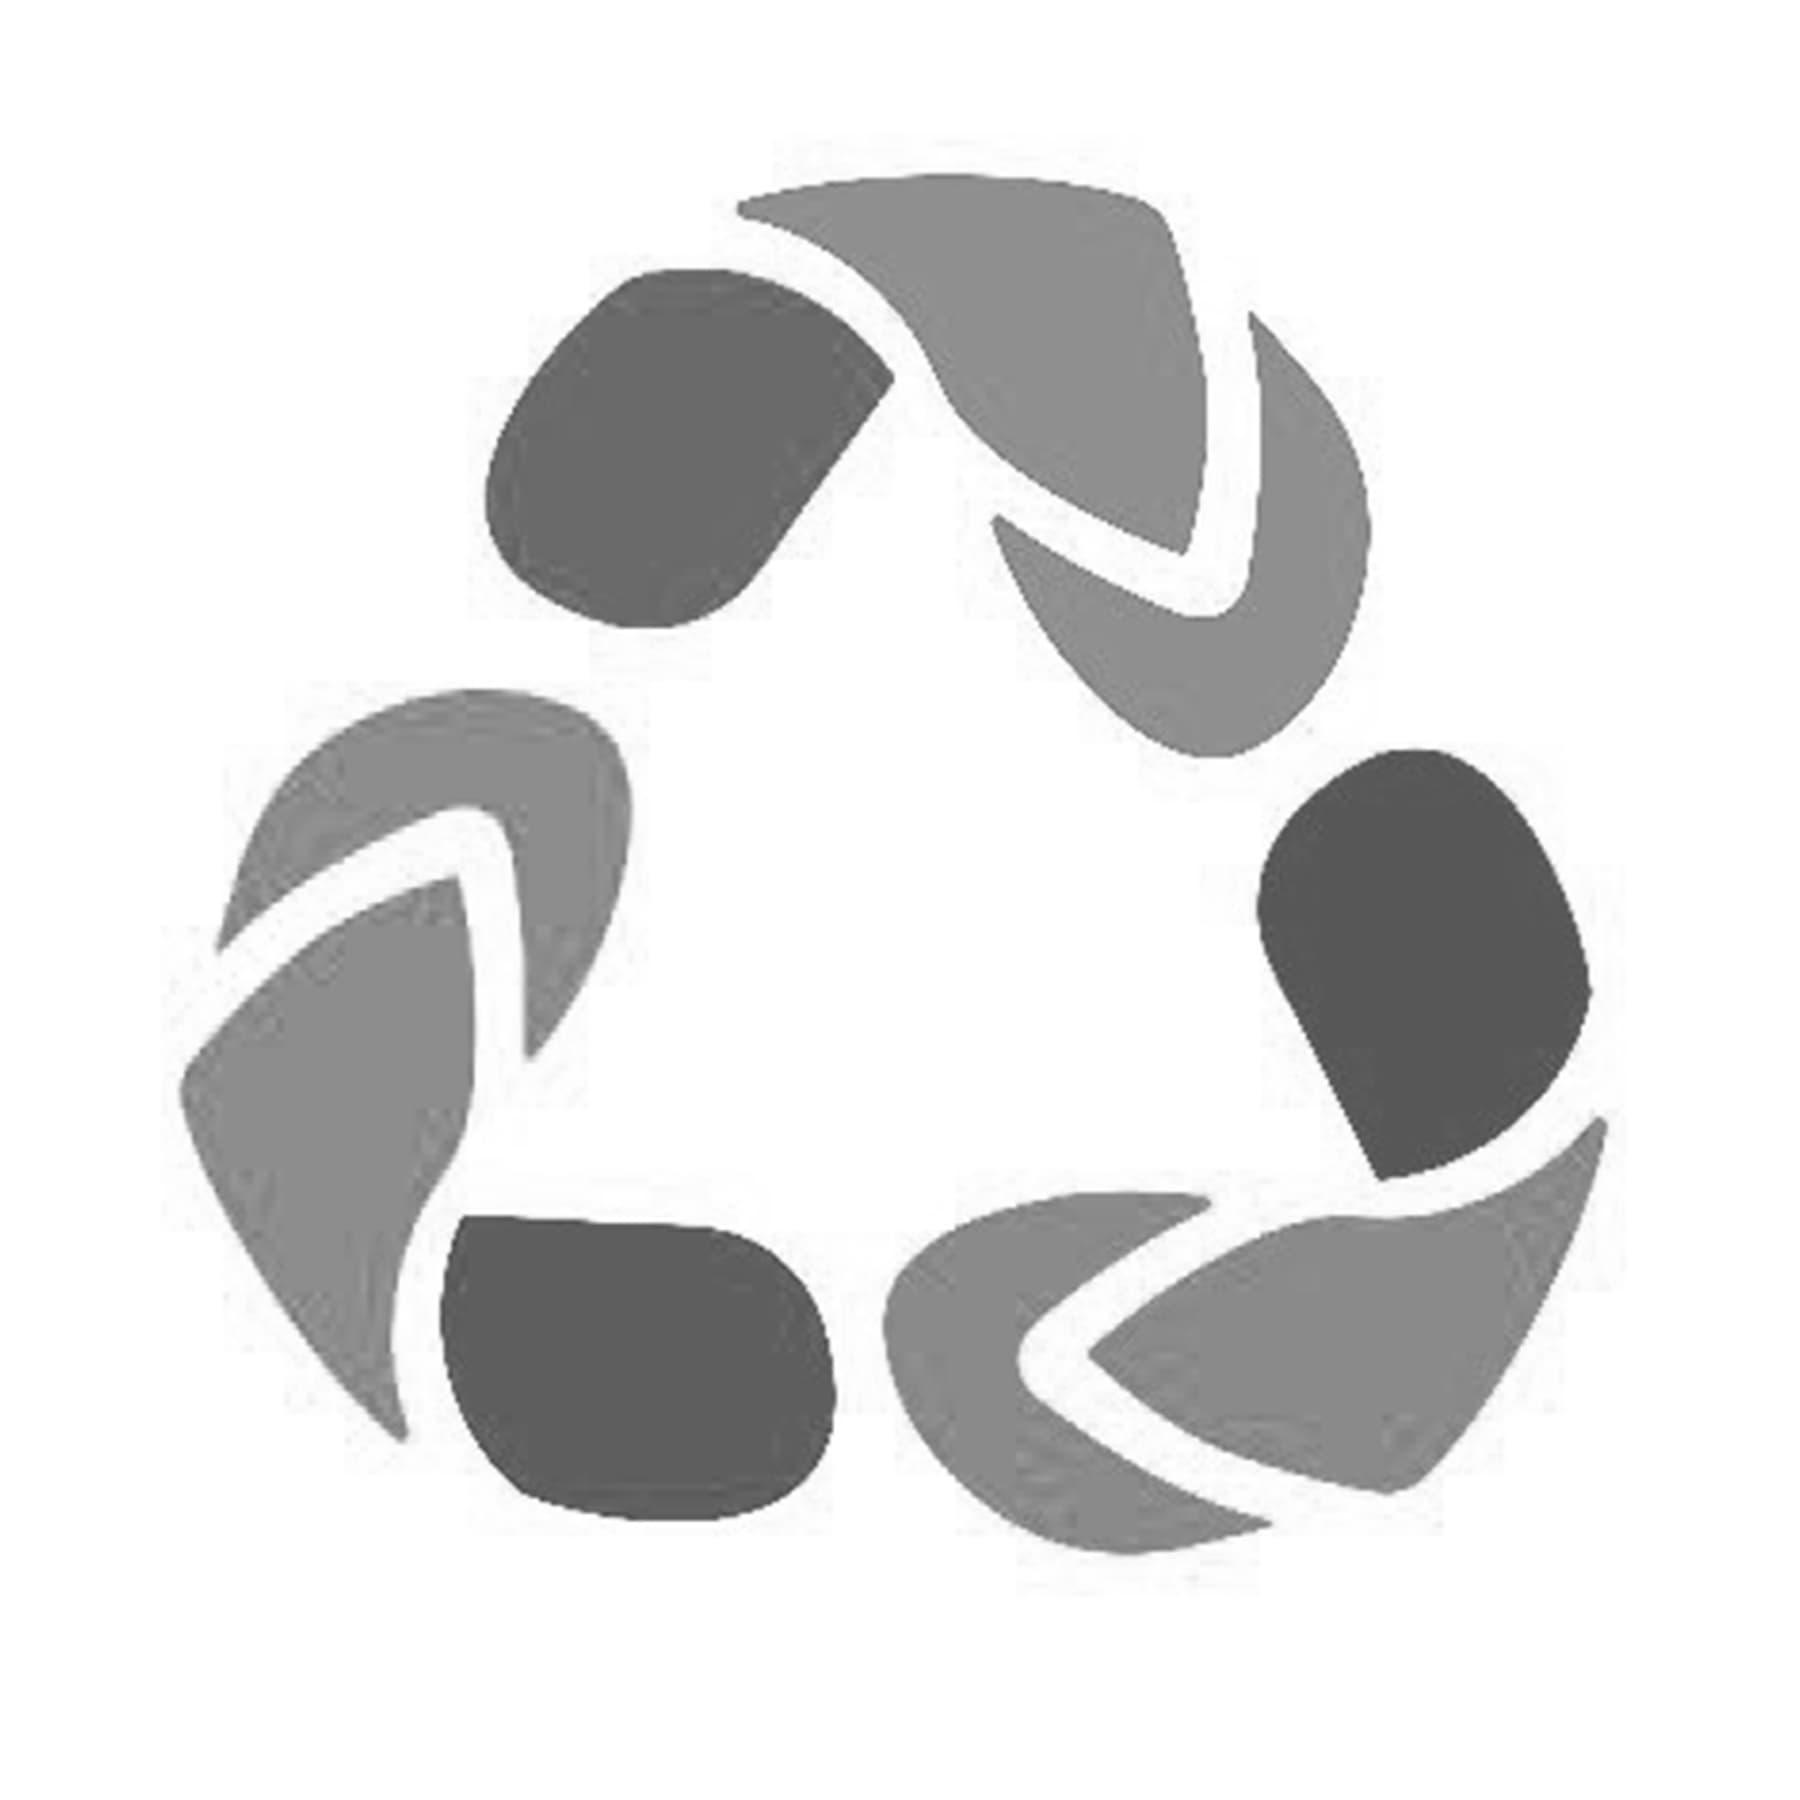 ocean-sole-logo.jpg